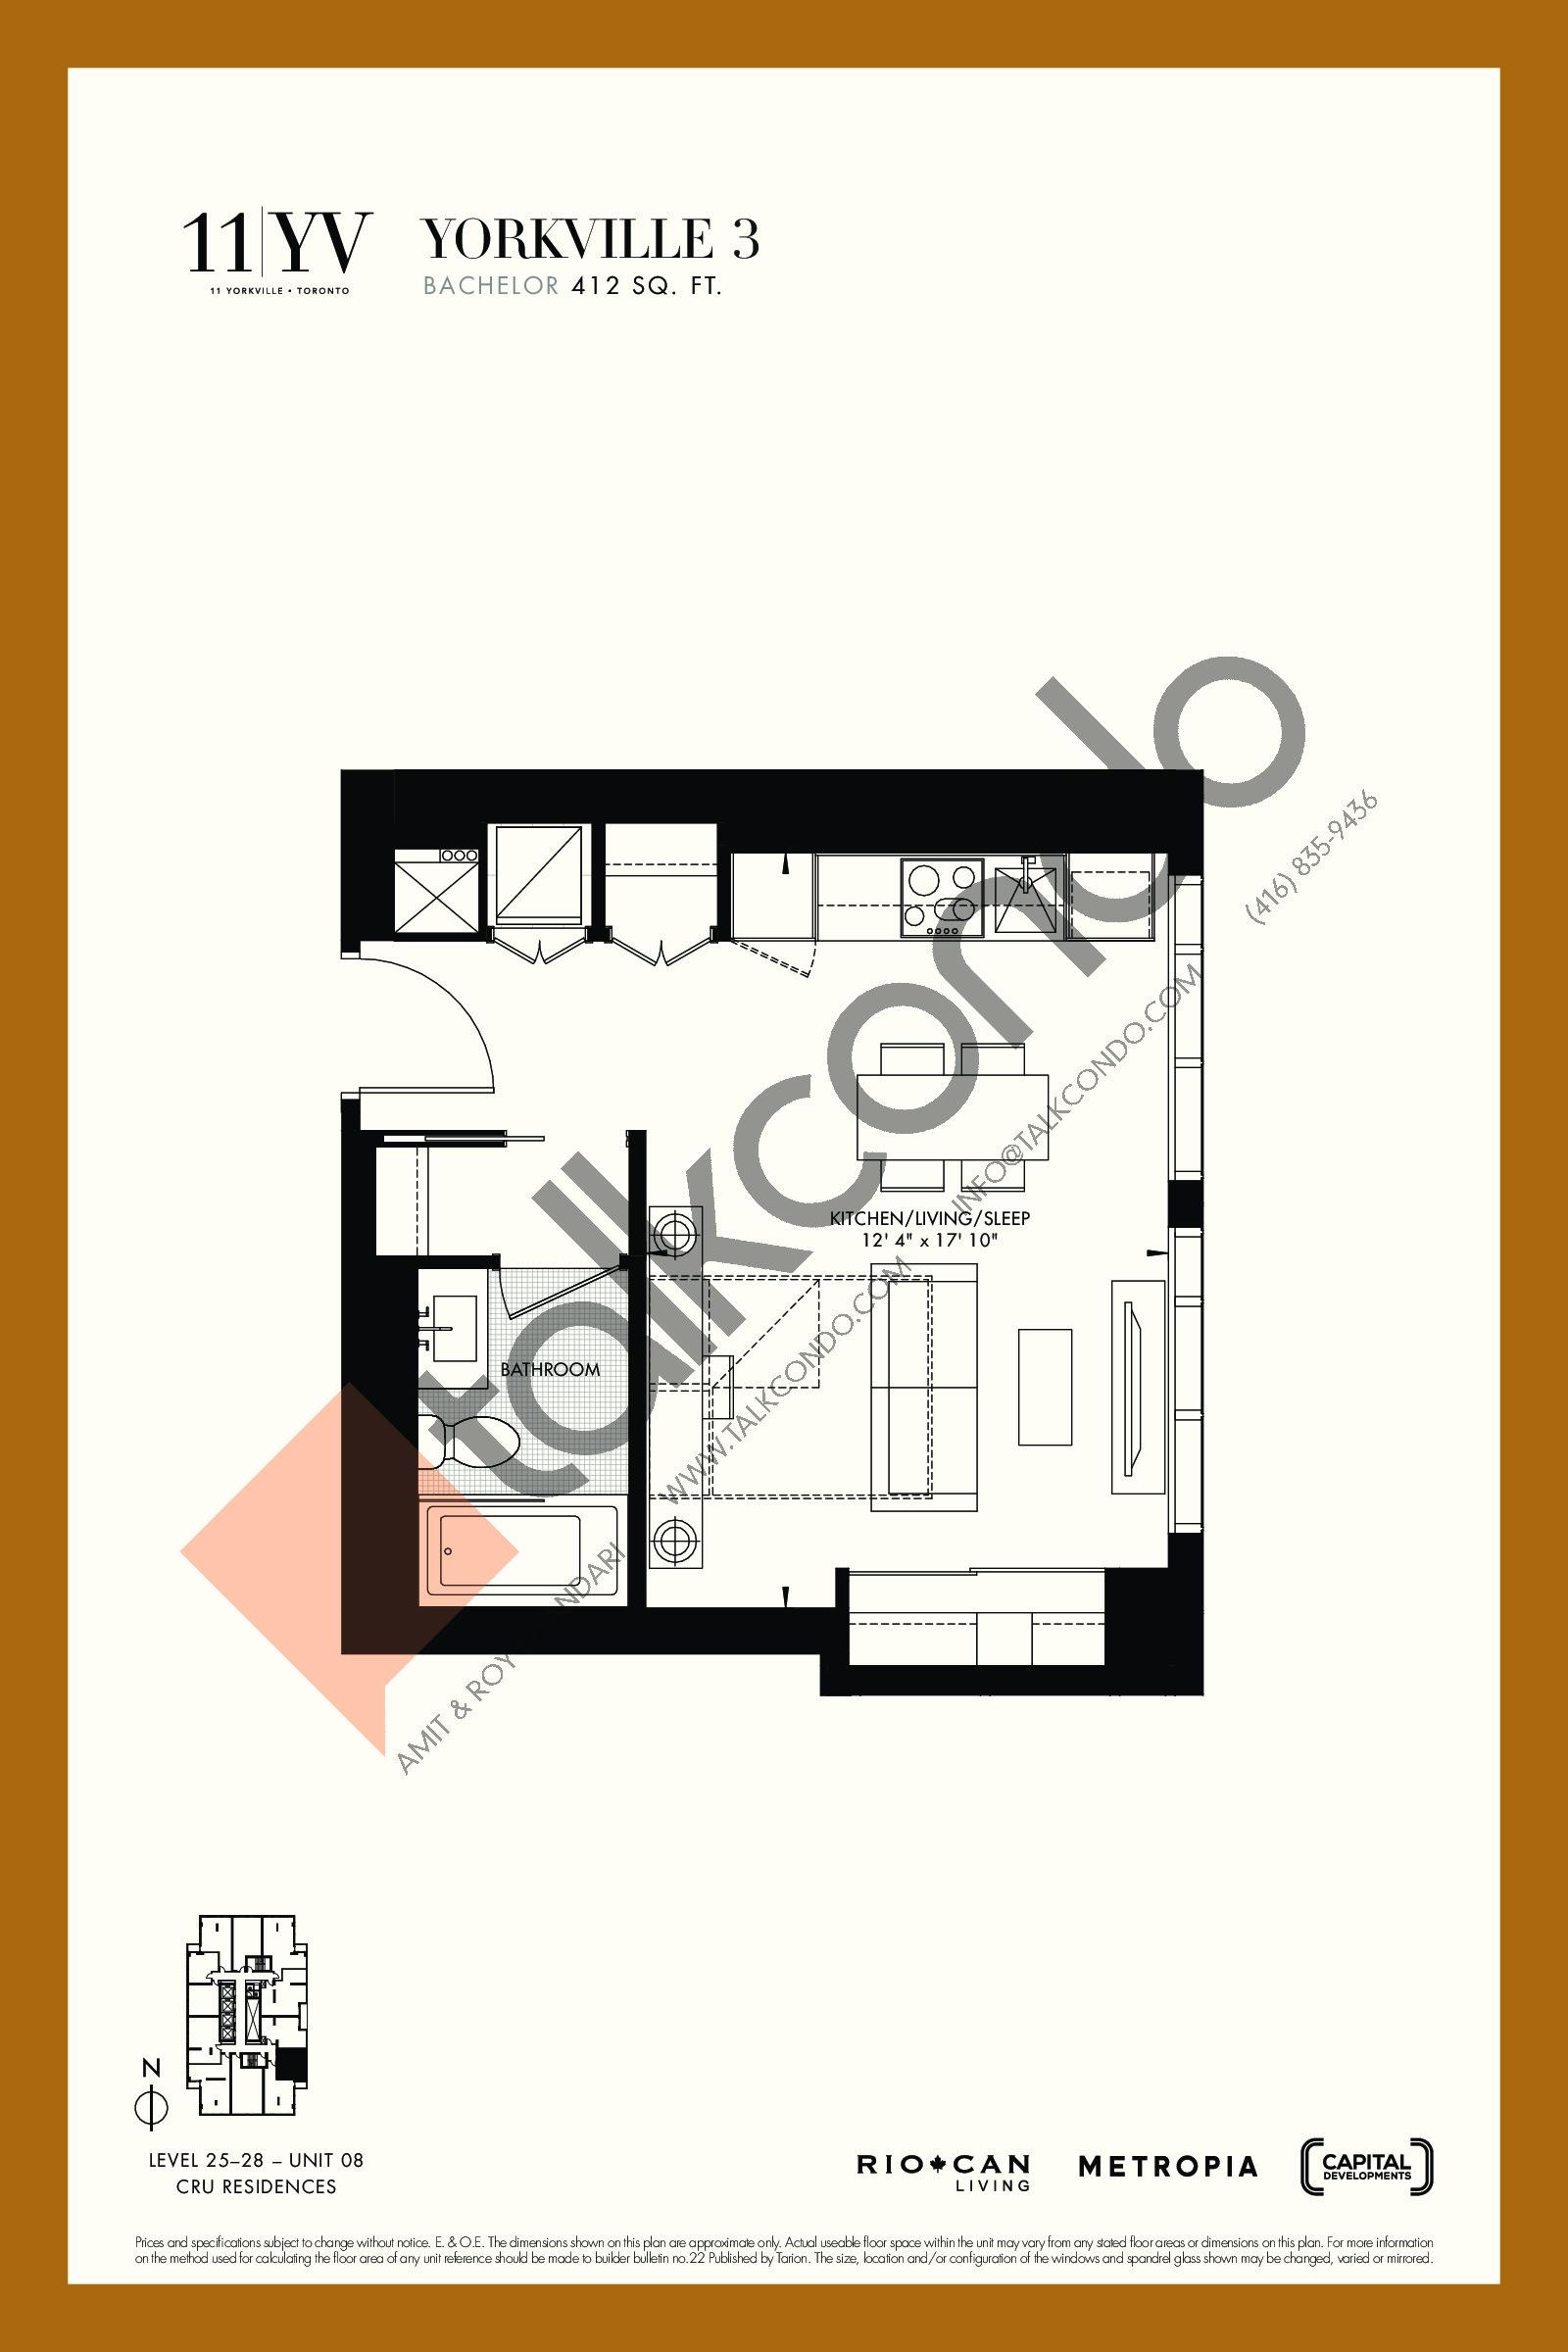 Yorkville 3 Floor Plan at 11YV Condos - 412 sq.ft